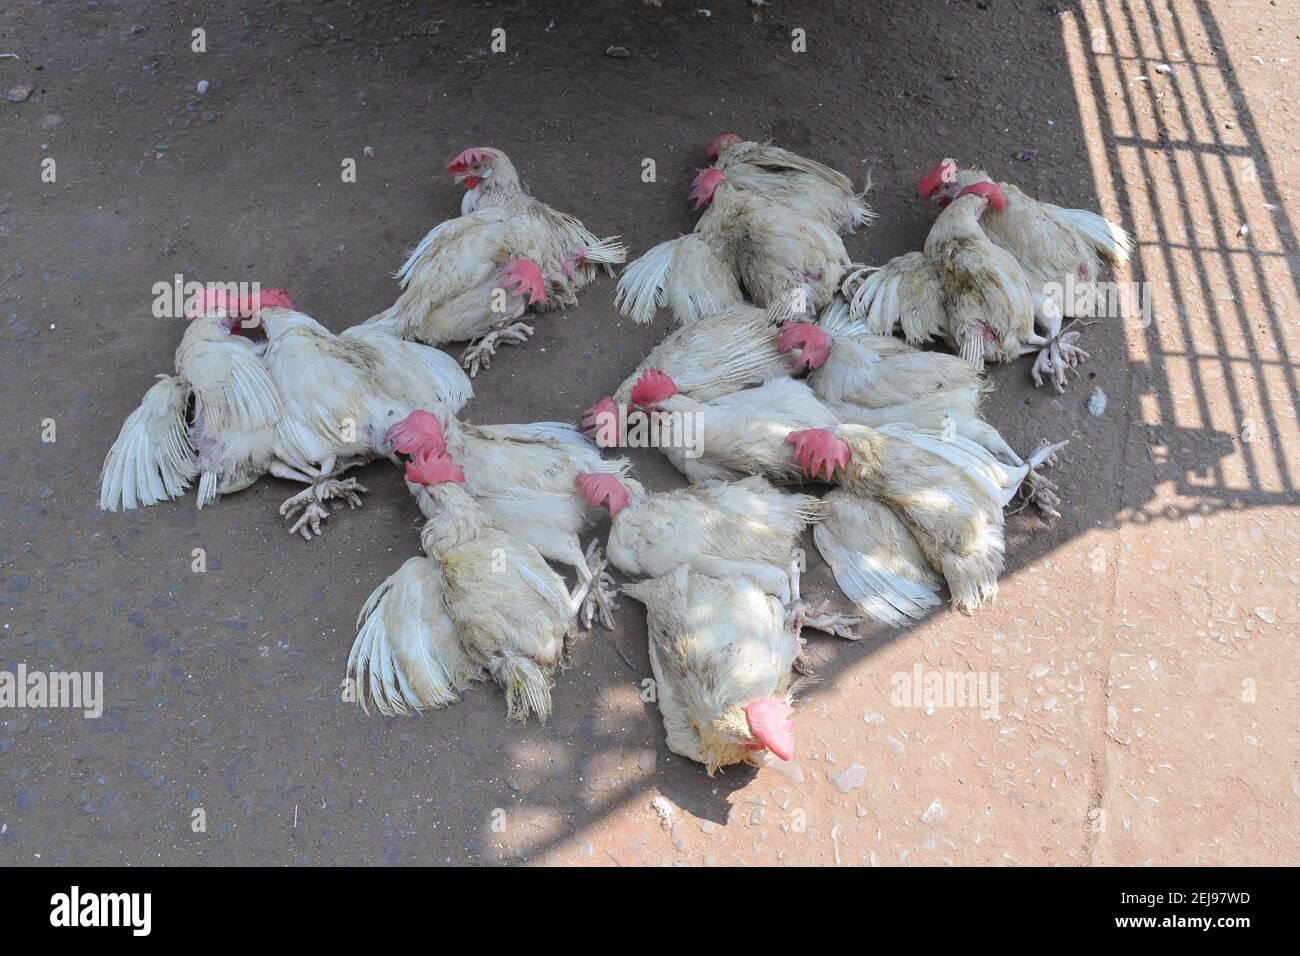 Jagdalpur - mercado de abuso de animales en Chhattisgarh-India Foto de stock